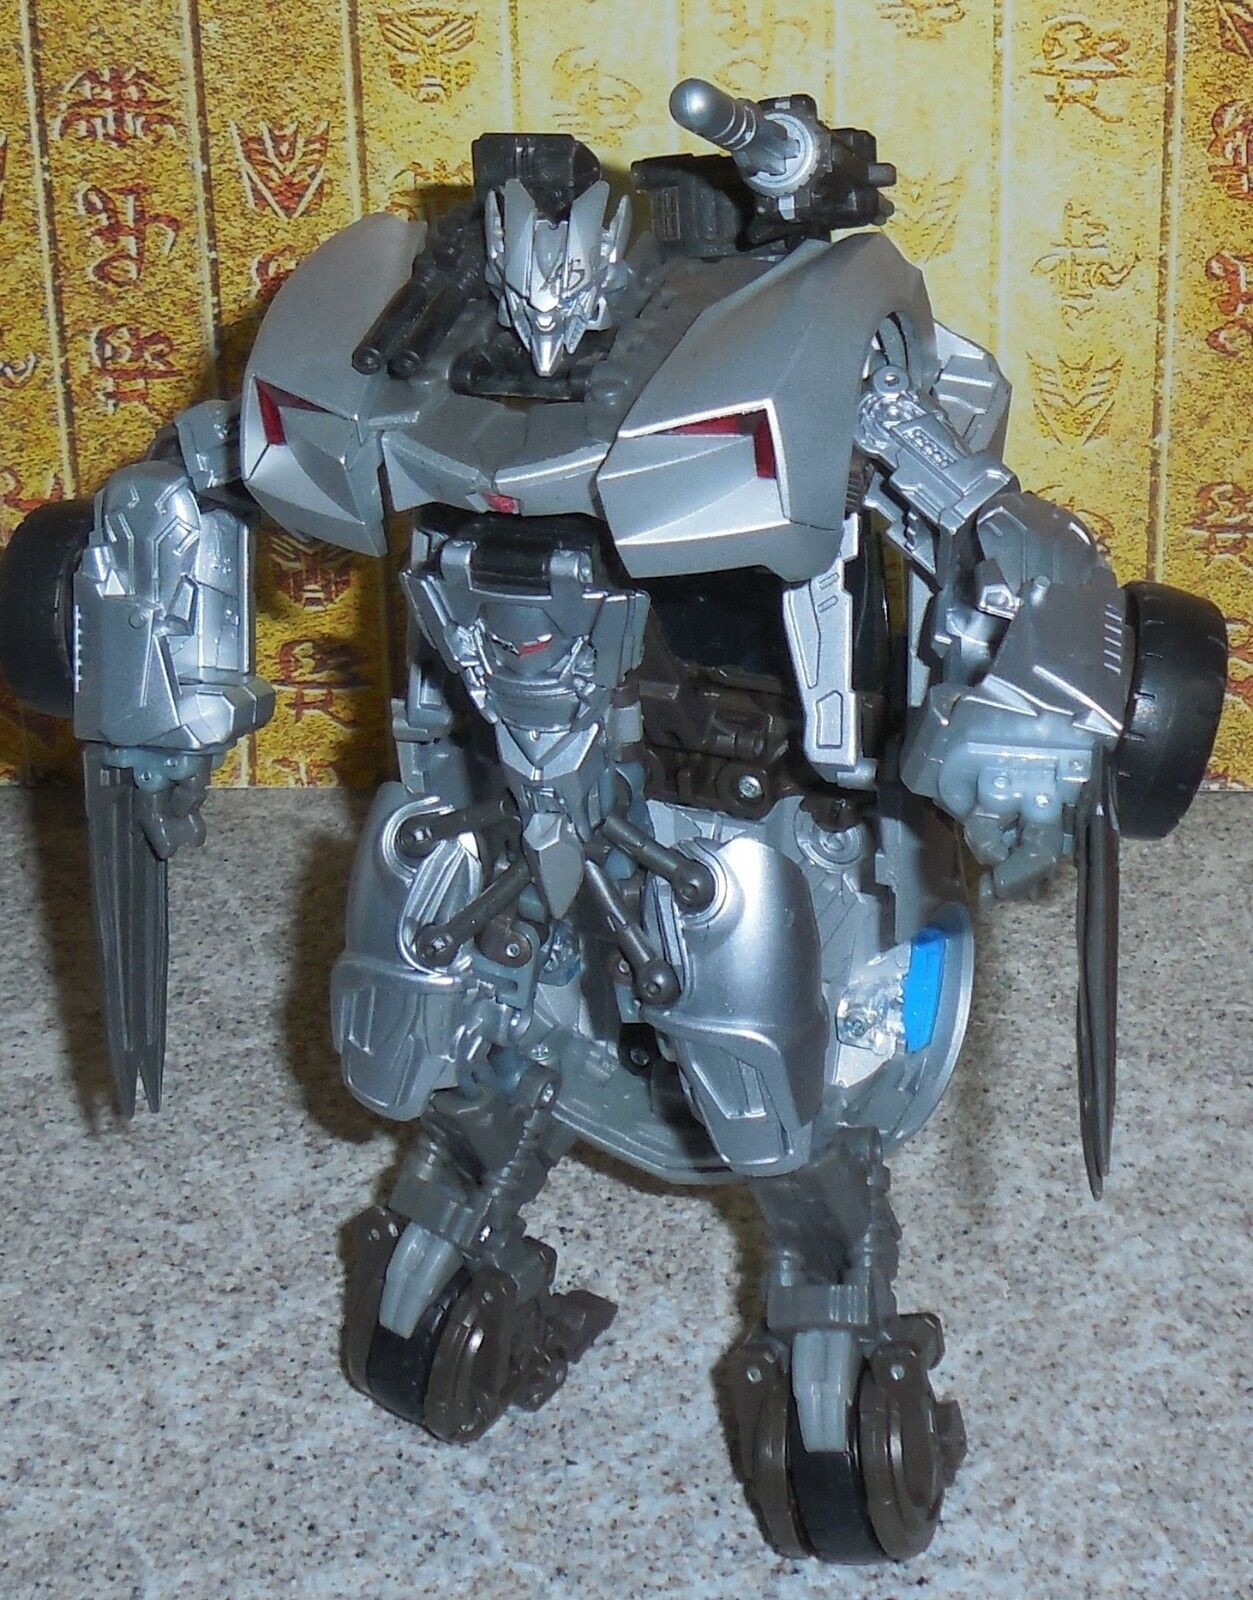 Transformers Humano Alianza Sideswipe redf Revenge Of The Fallen